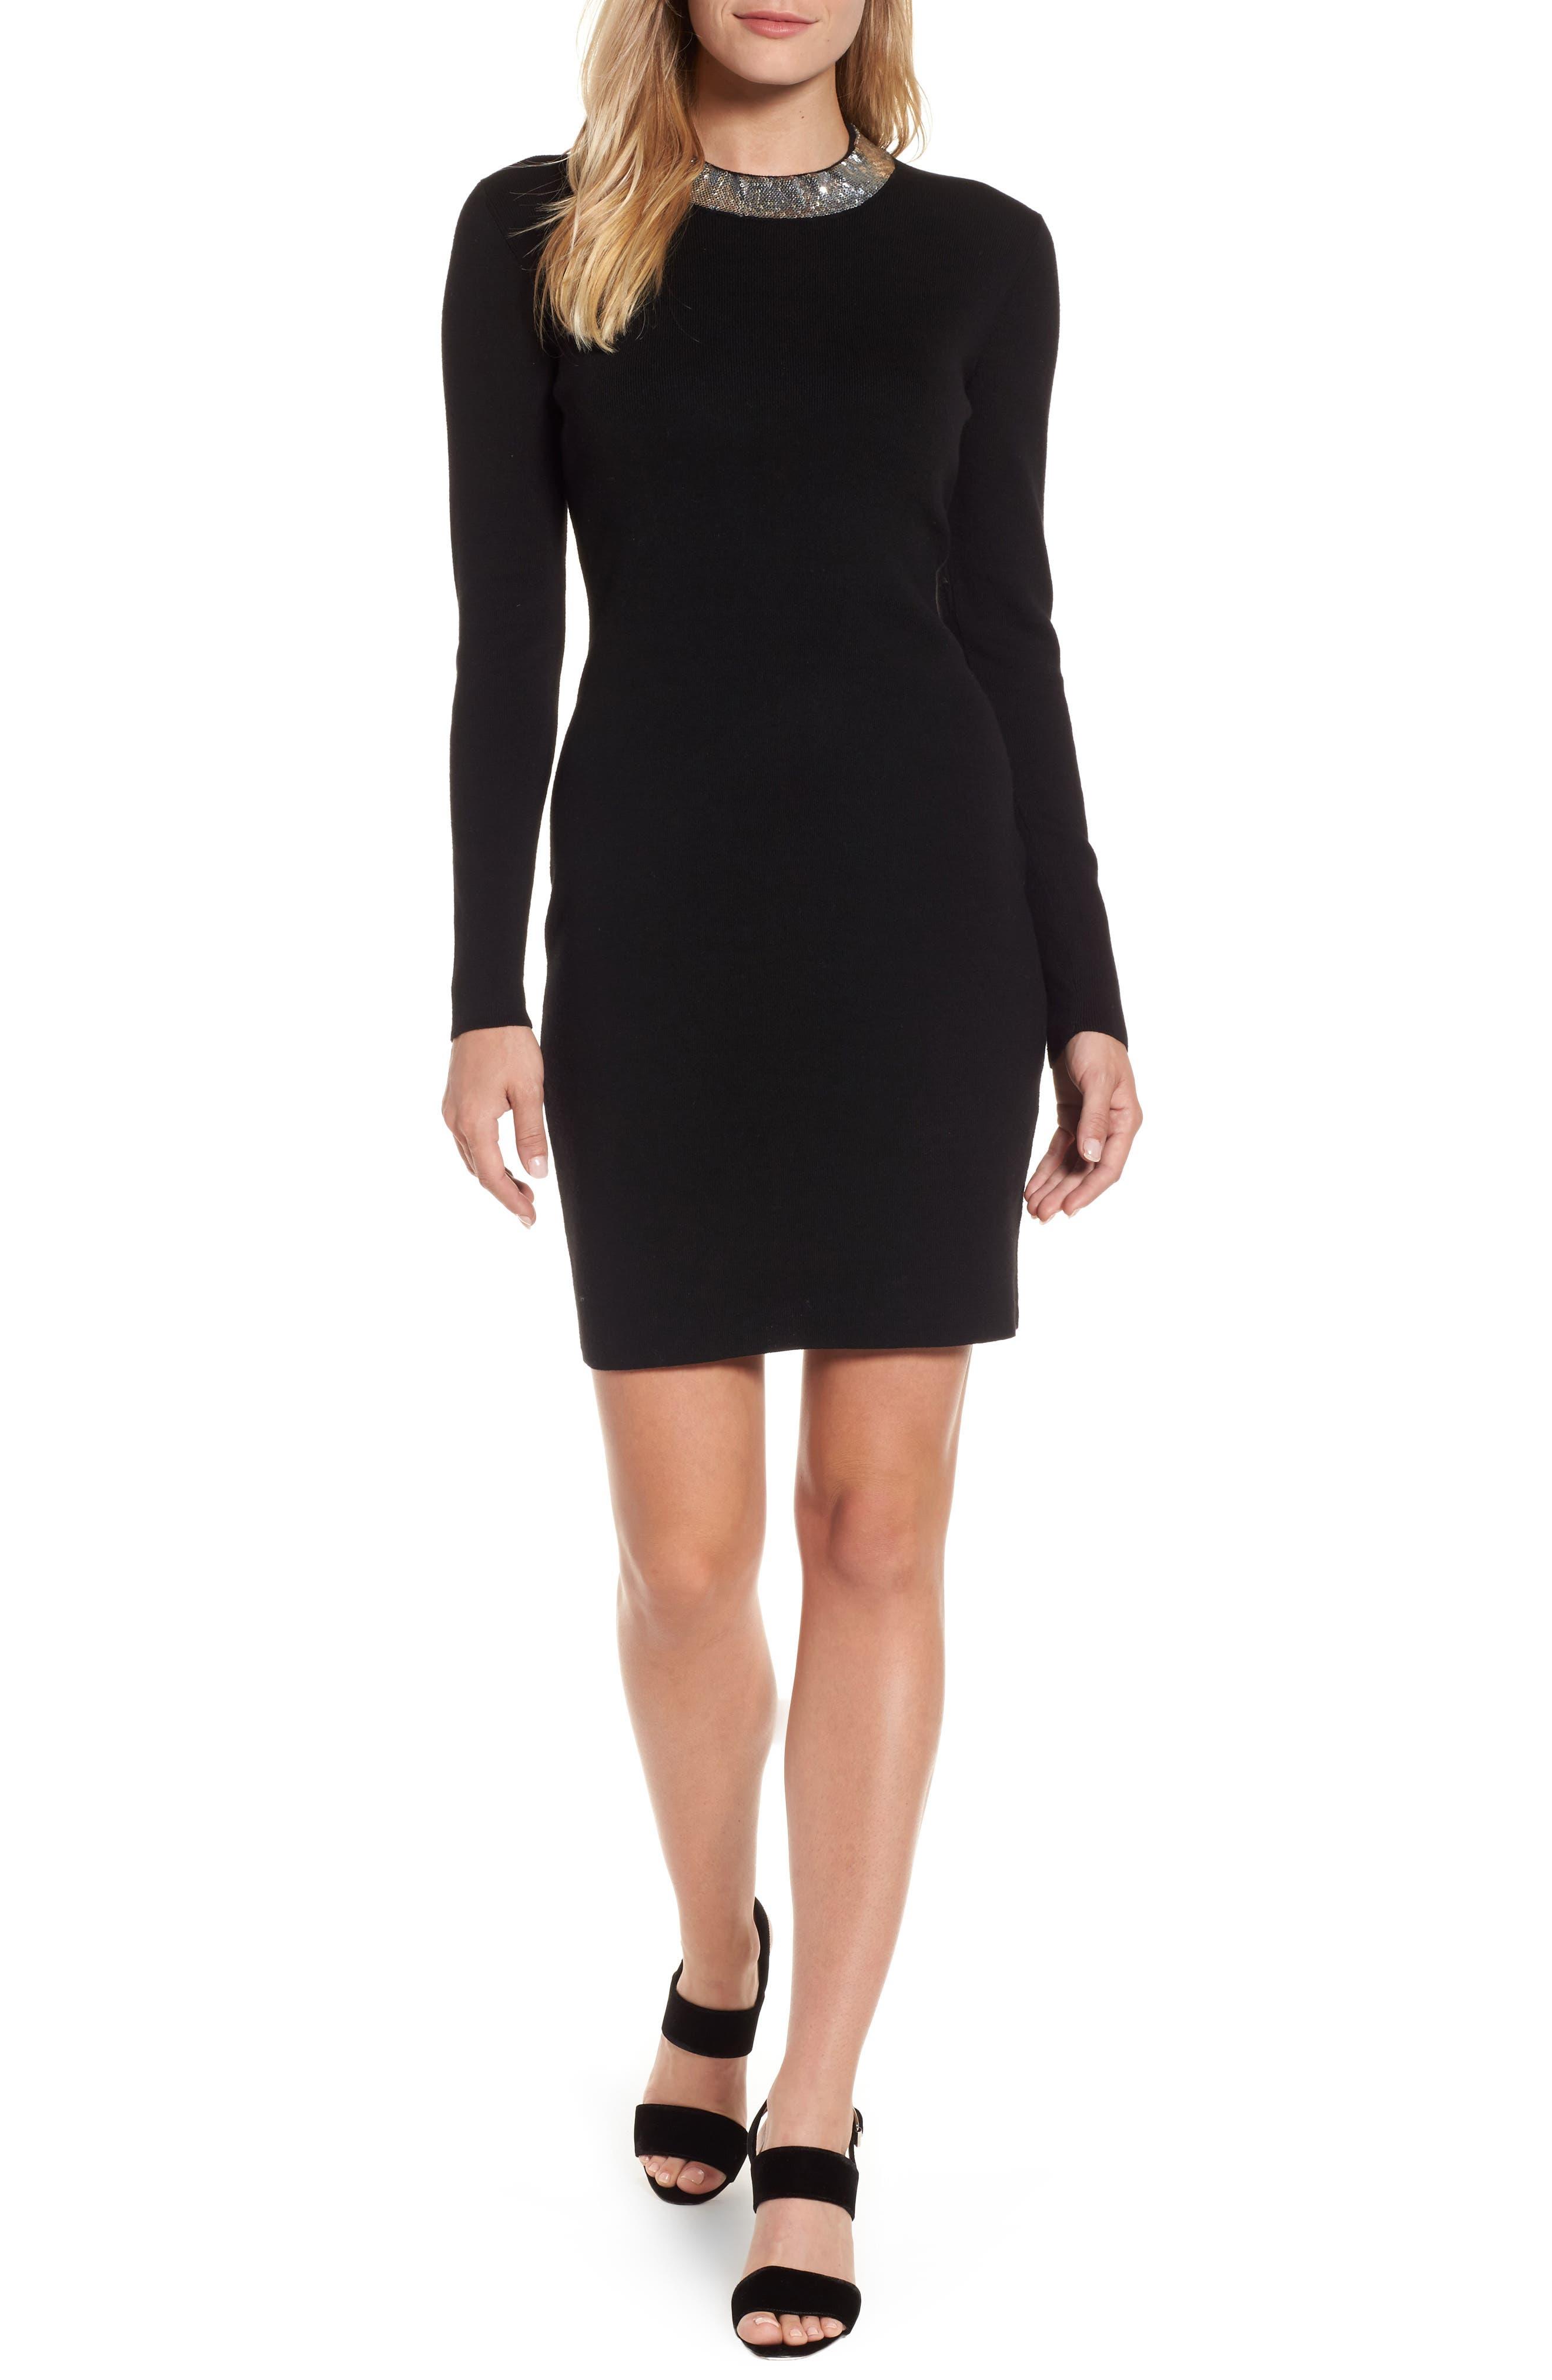 Main Image - MICHAEL MIchael Kors Sequin Collar Dress